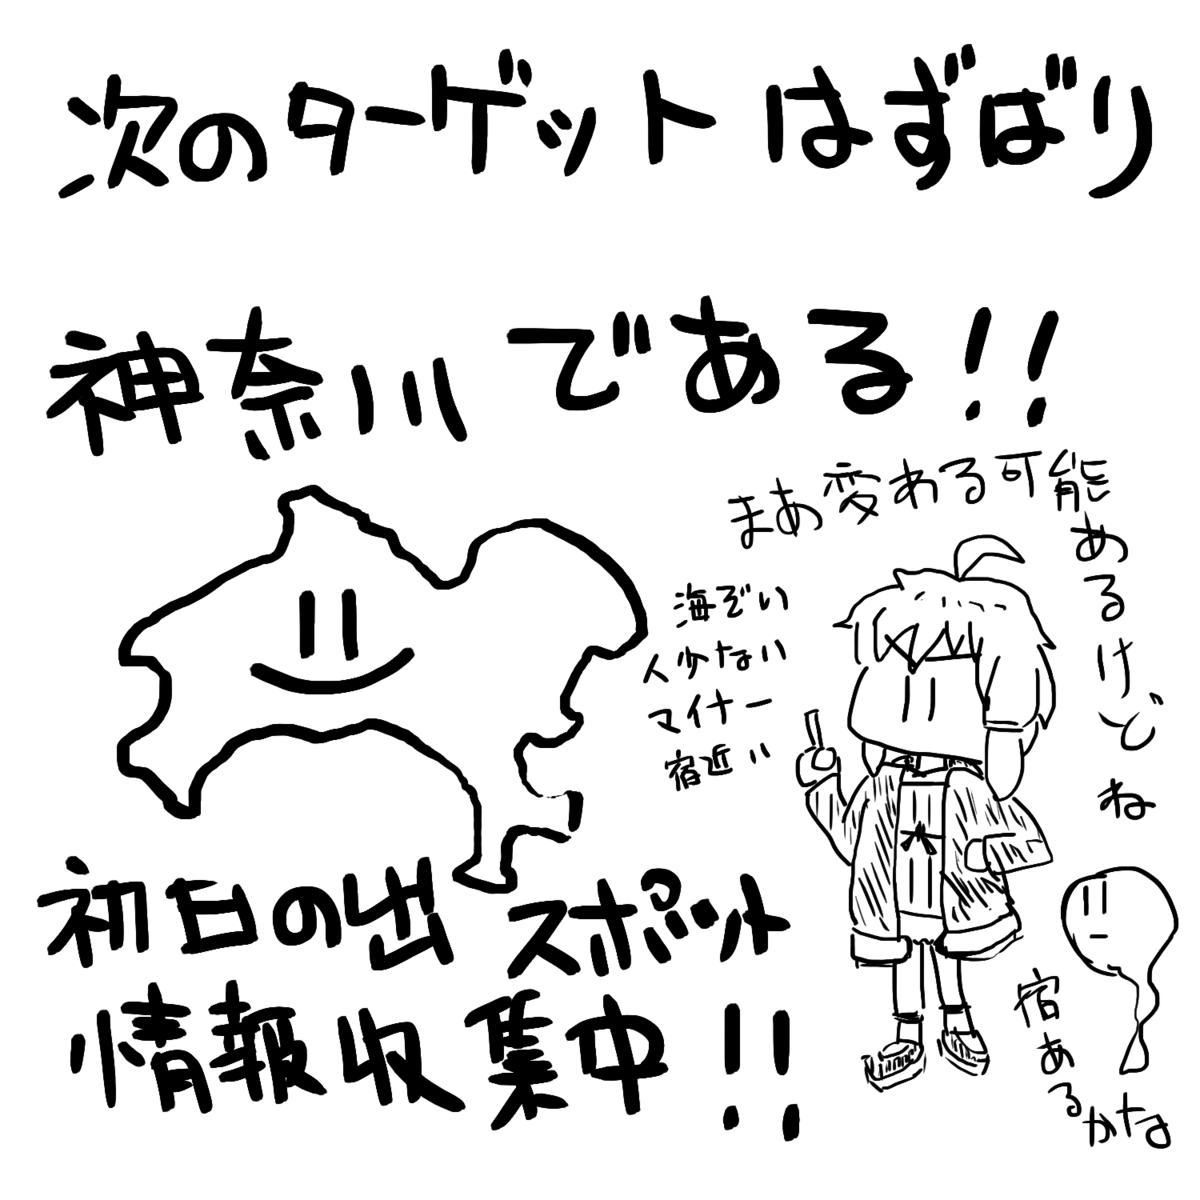 f:id:zomuzomu:20191114110737p:plain